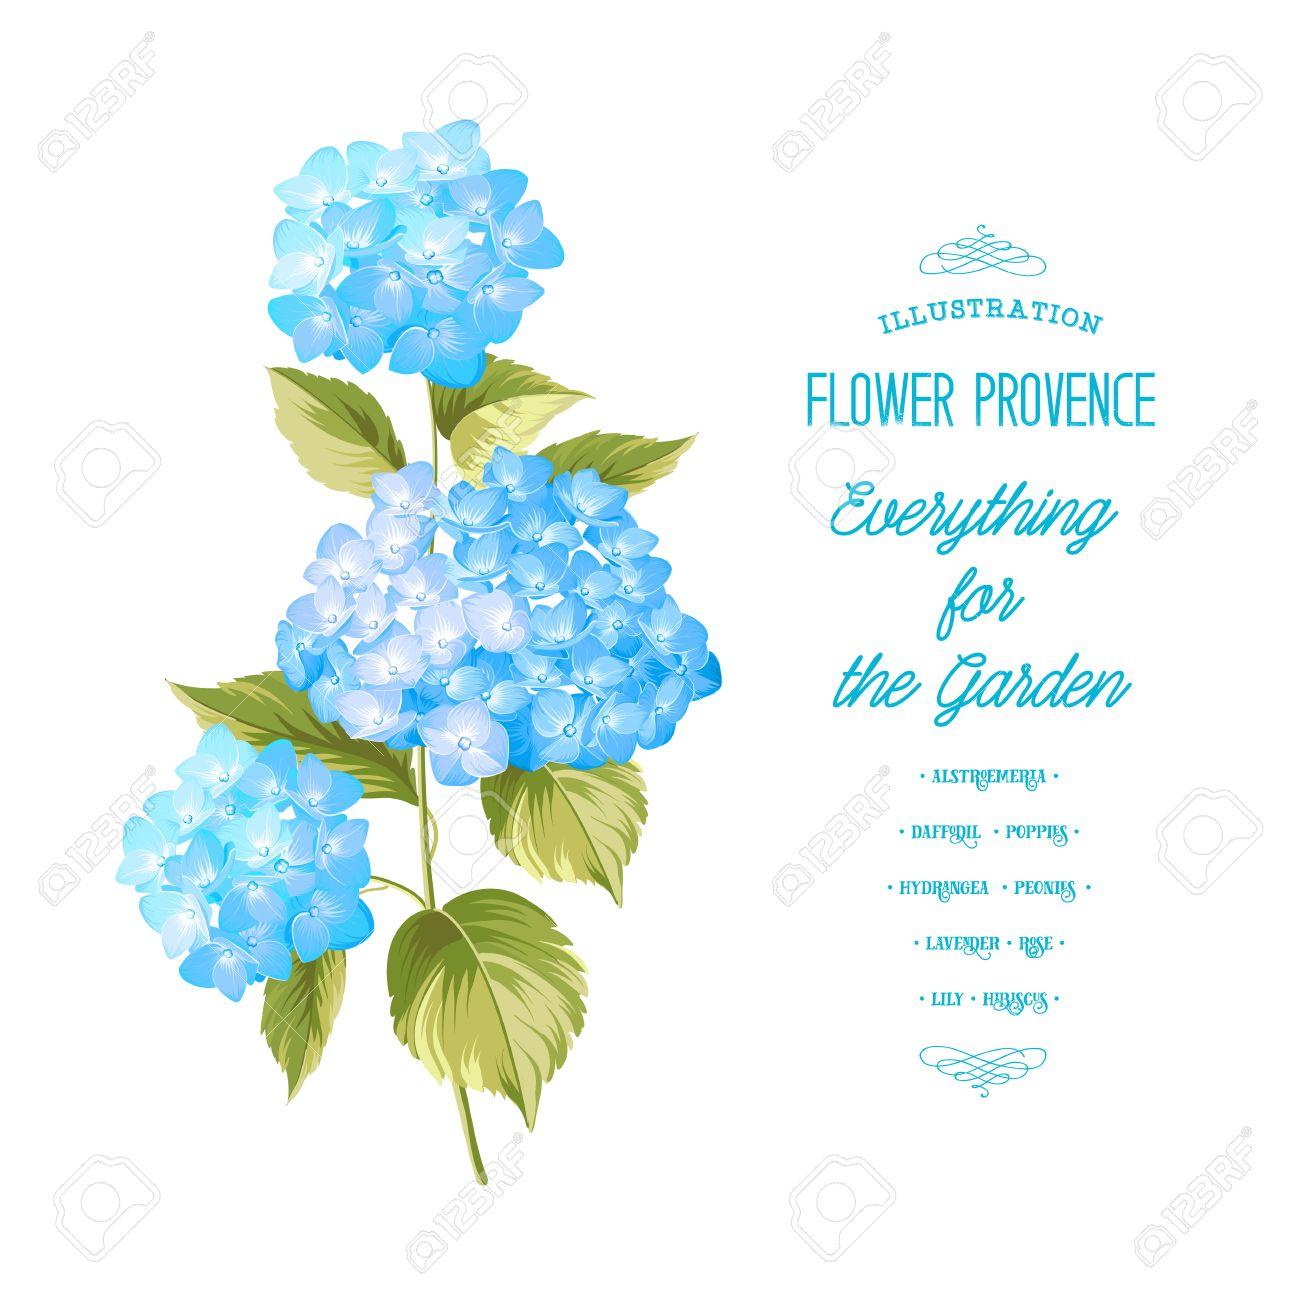 Flor De Hortensia Hortensias Realista Azul Ilustracion De Flores